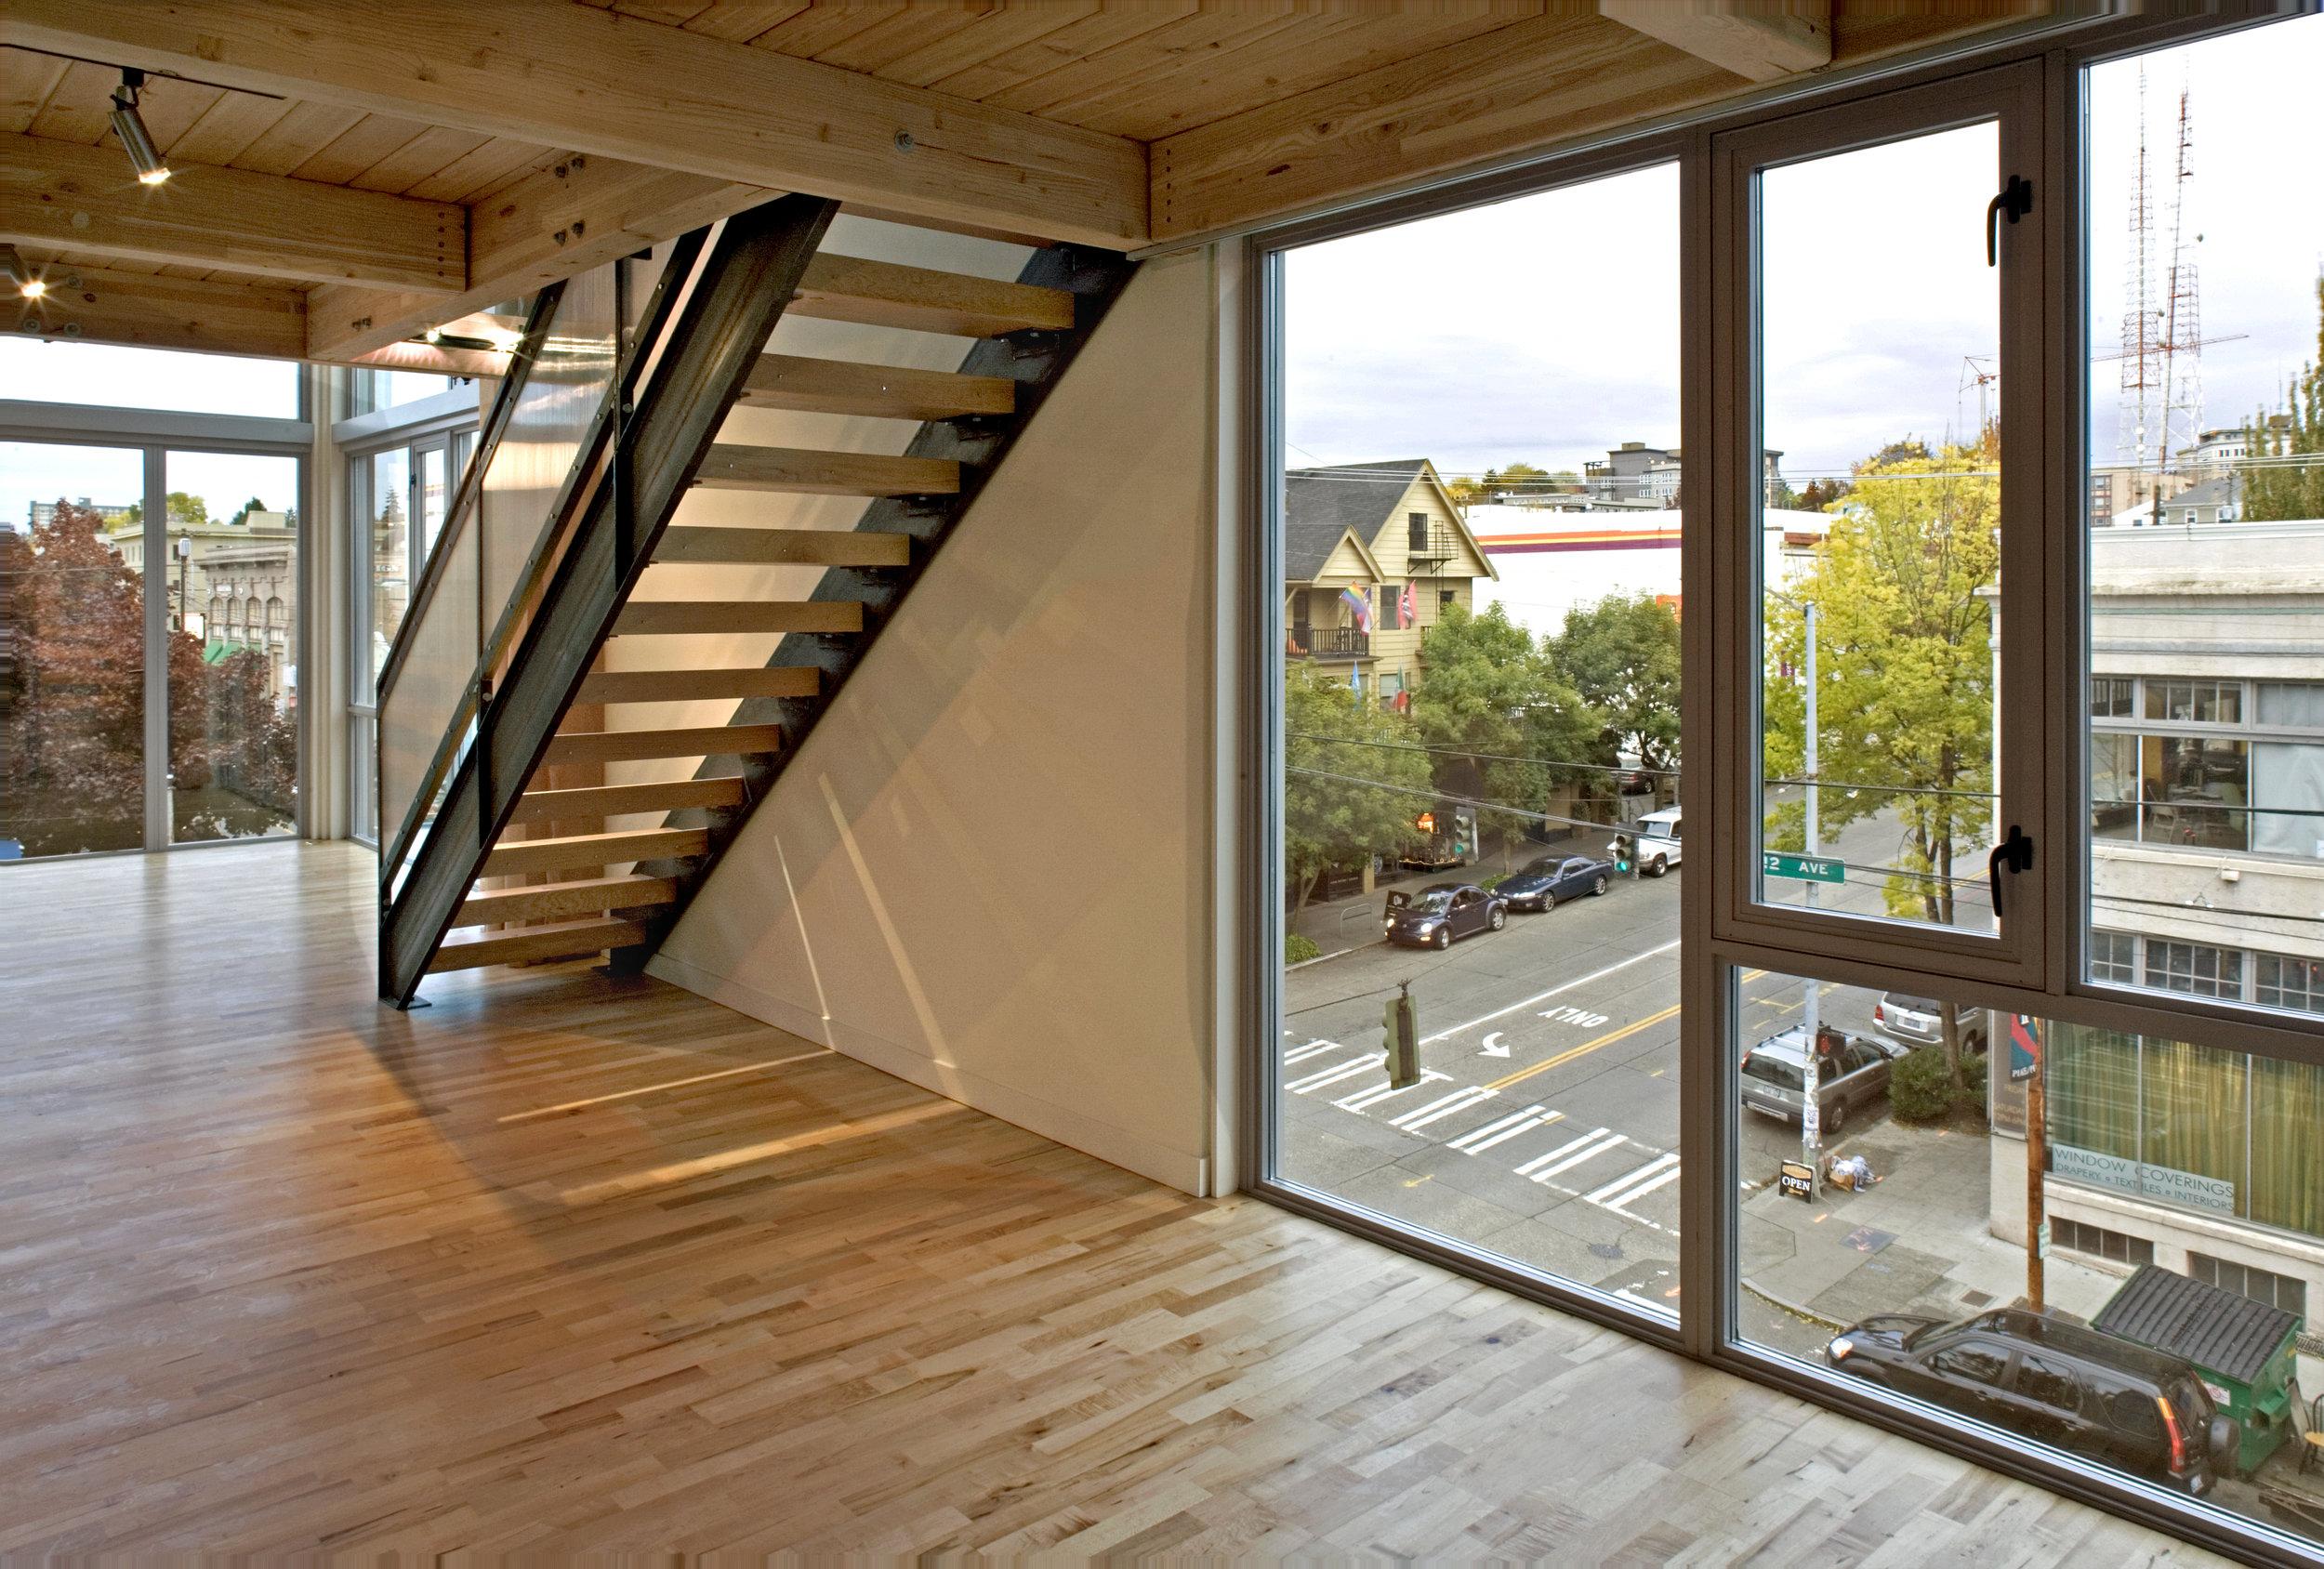 407-living area